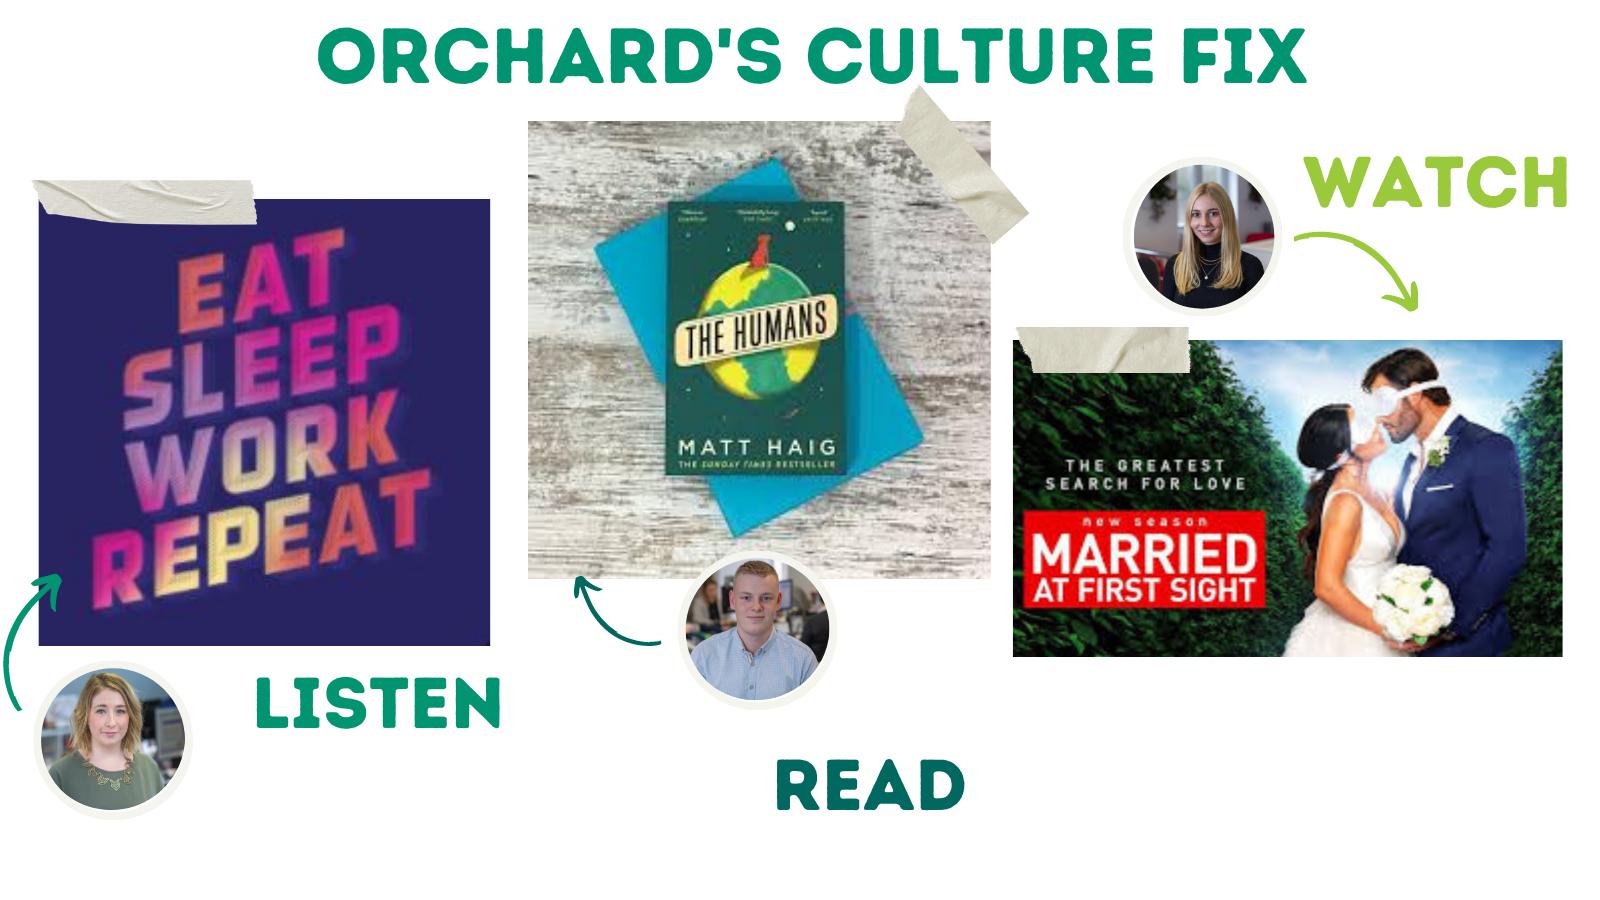 Orchard's culture fix #2